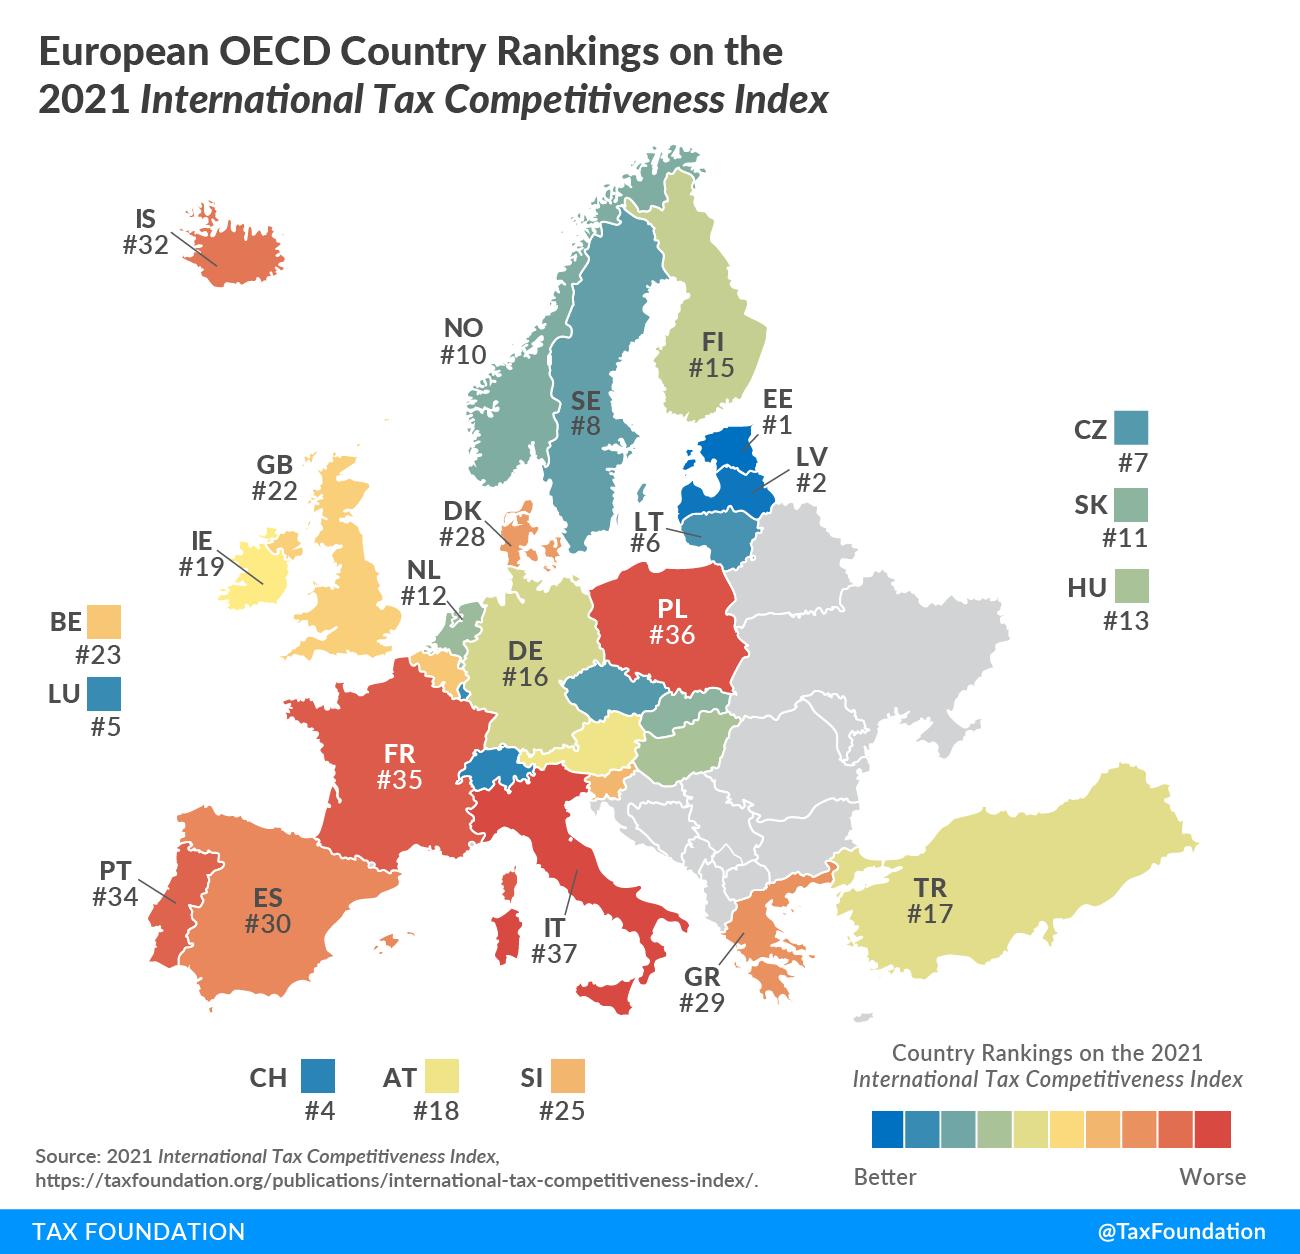 2021 International Tax Competitiveness Index Rankings in Europe, 2021 Global Tax Competitiveness Rankings, 2021 Global Tax Rankings in OECD Global Tax